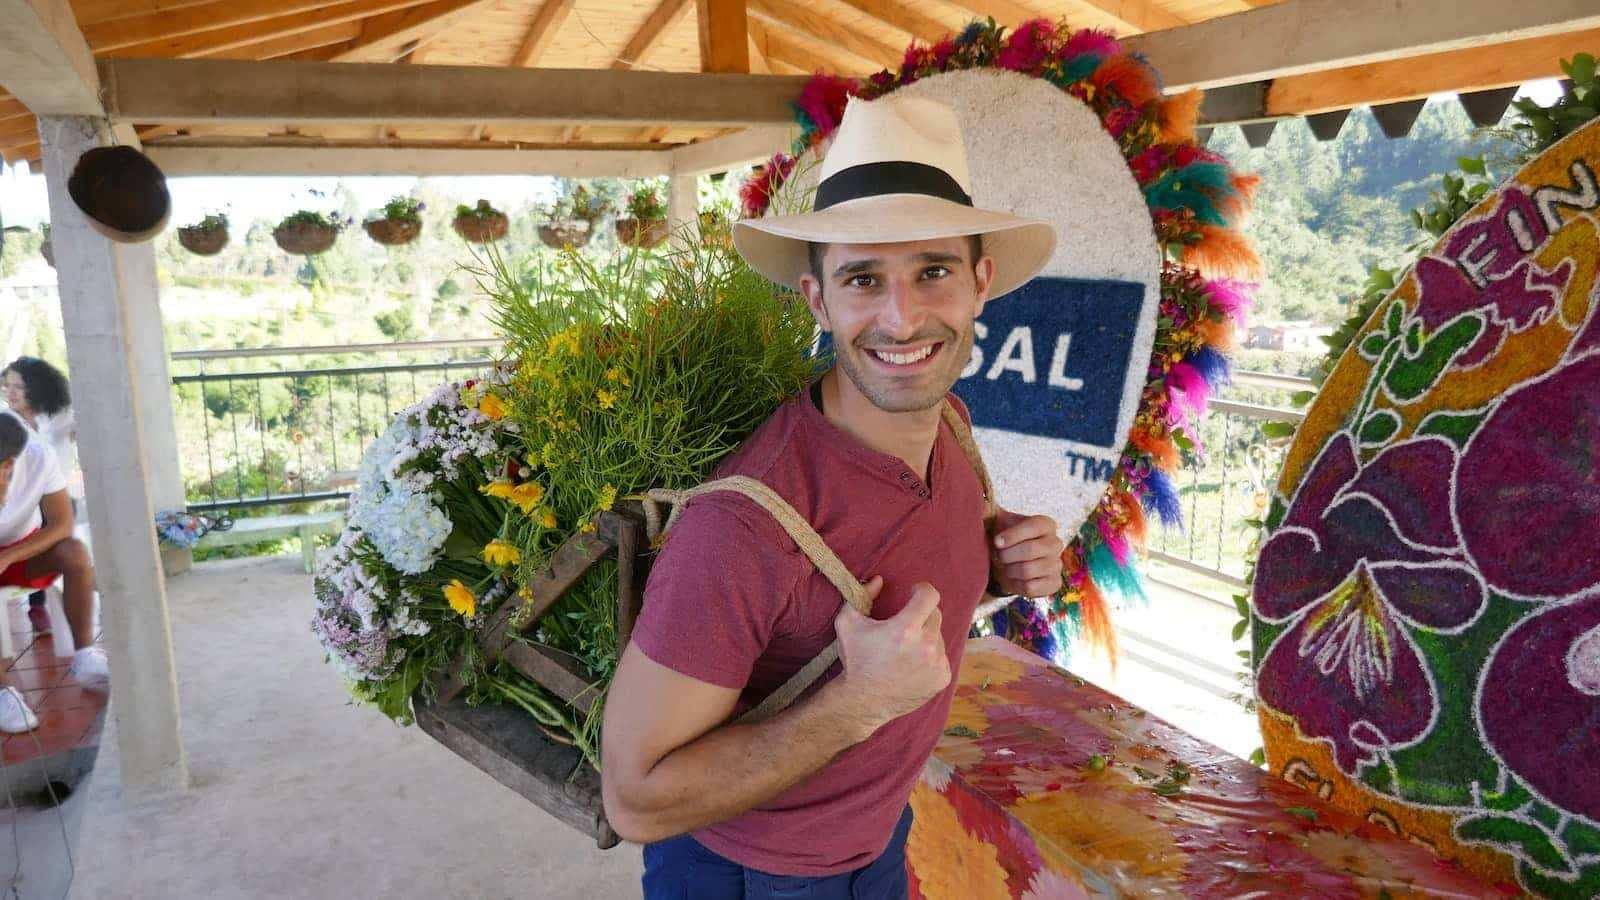 Medellin flower festival silletera farm